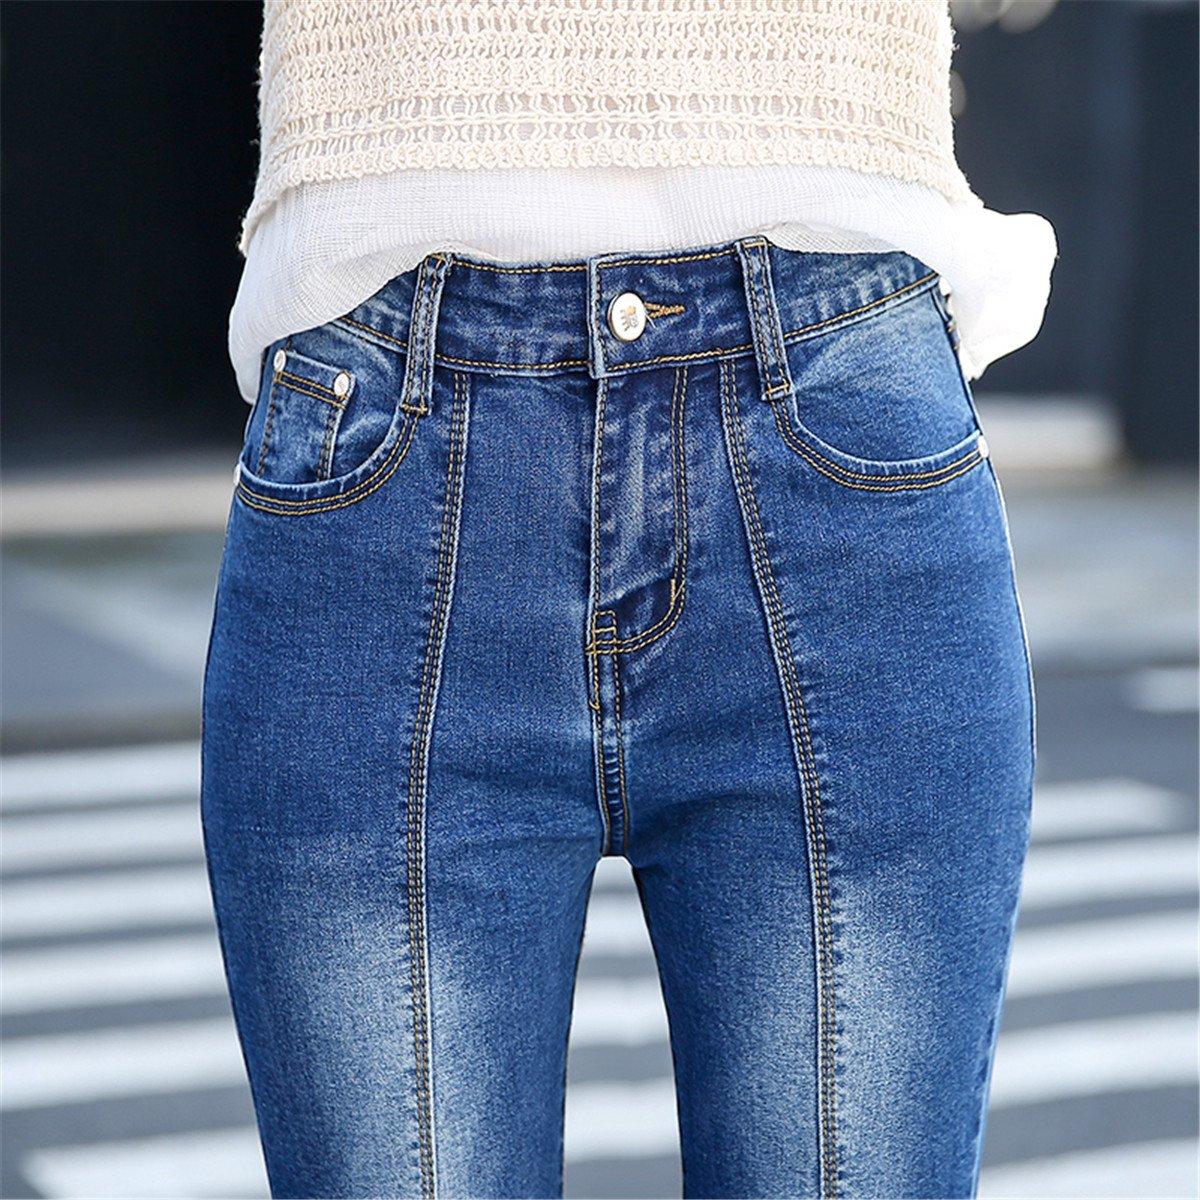 Amazon.com: Flared Jeans - Pantalones vaqueros para mujer ...